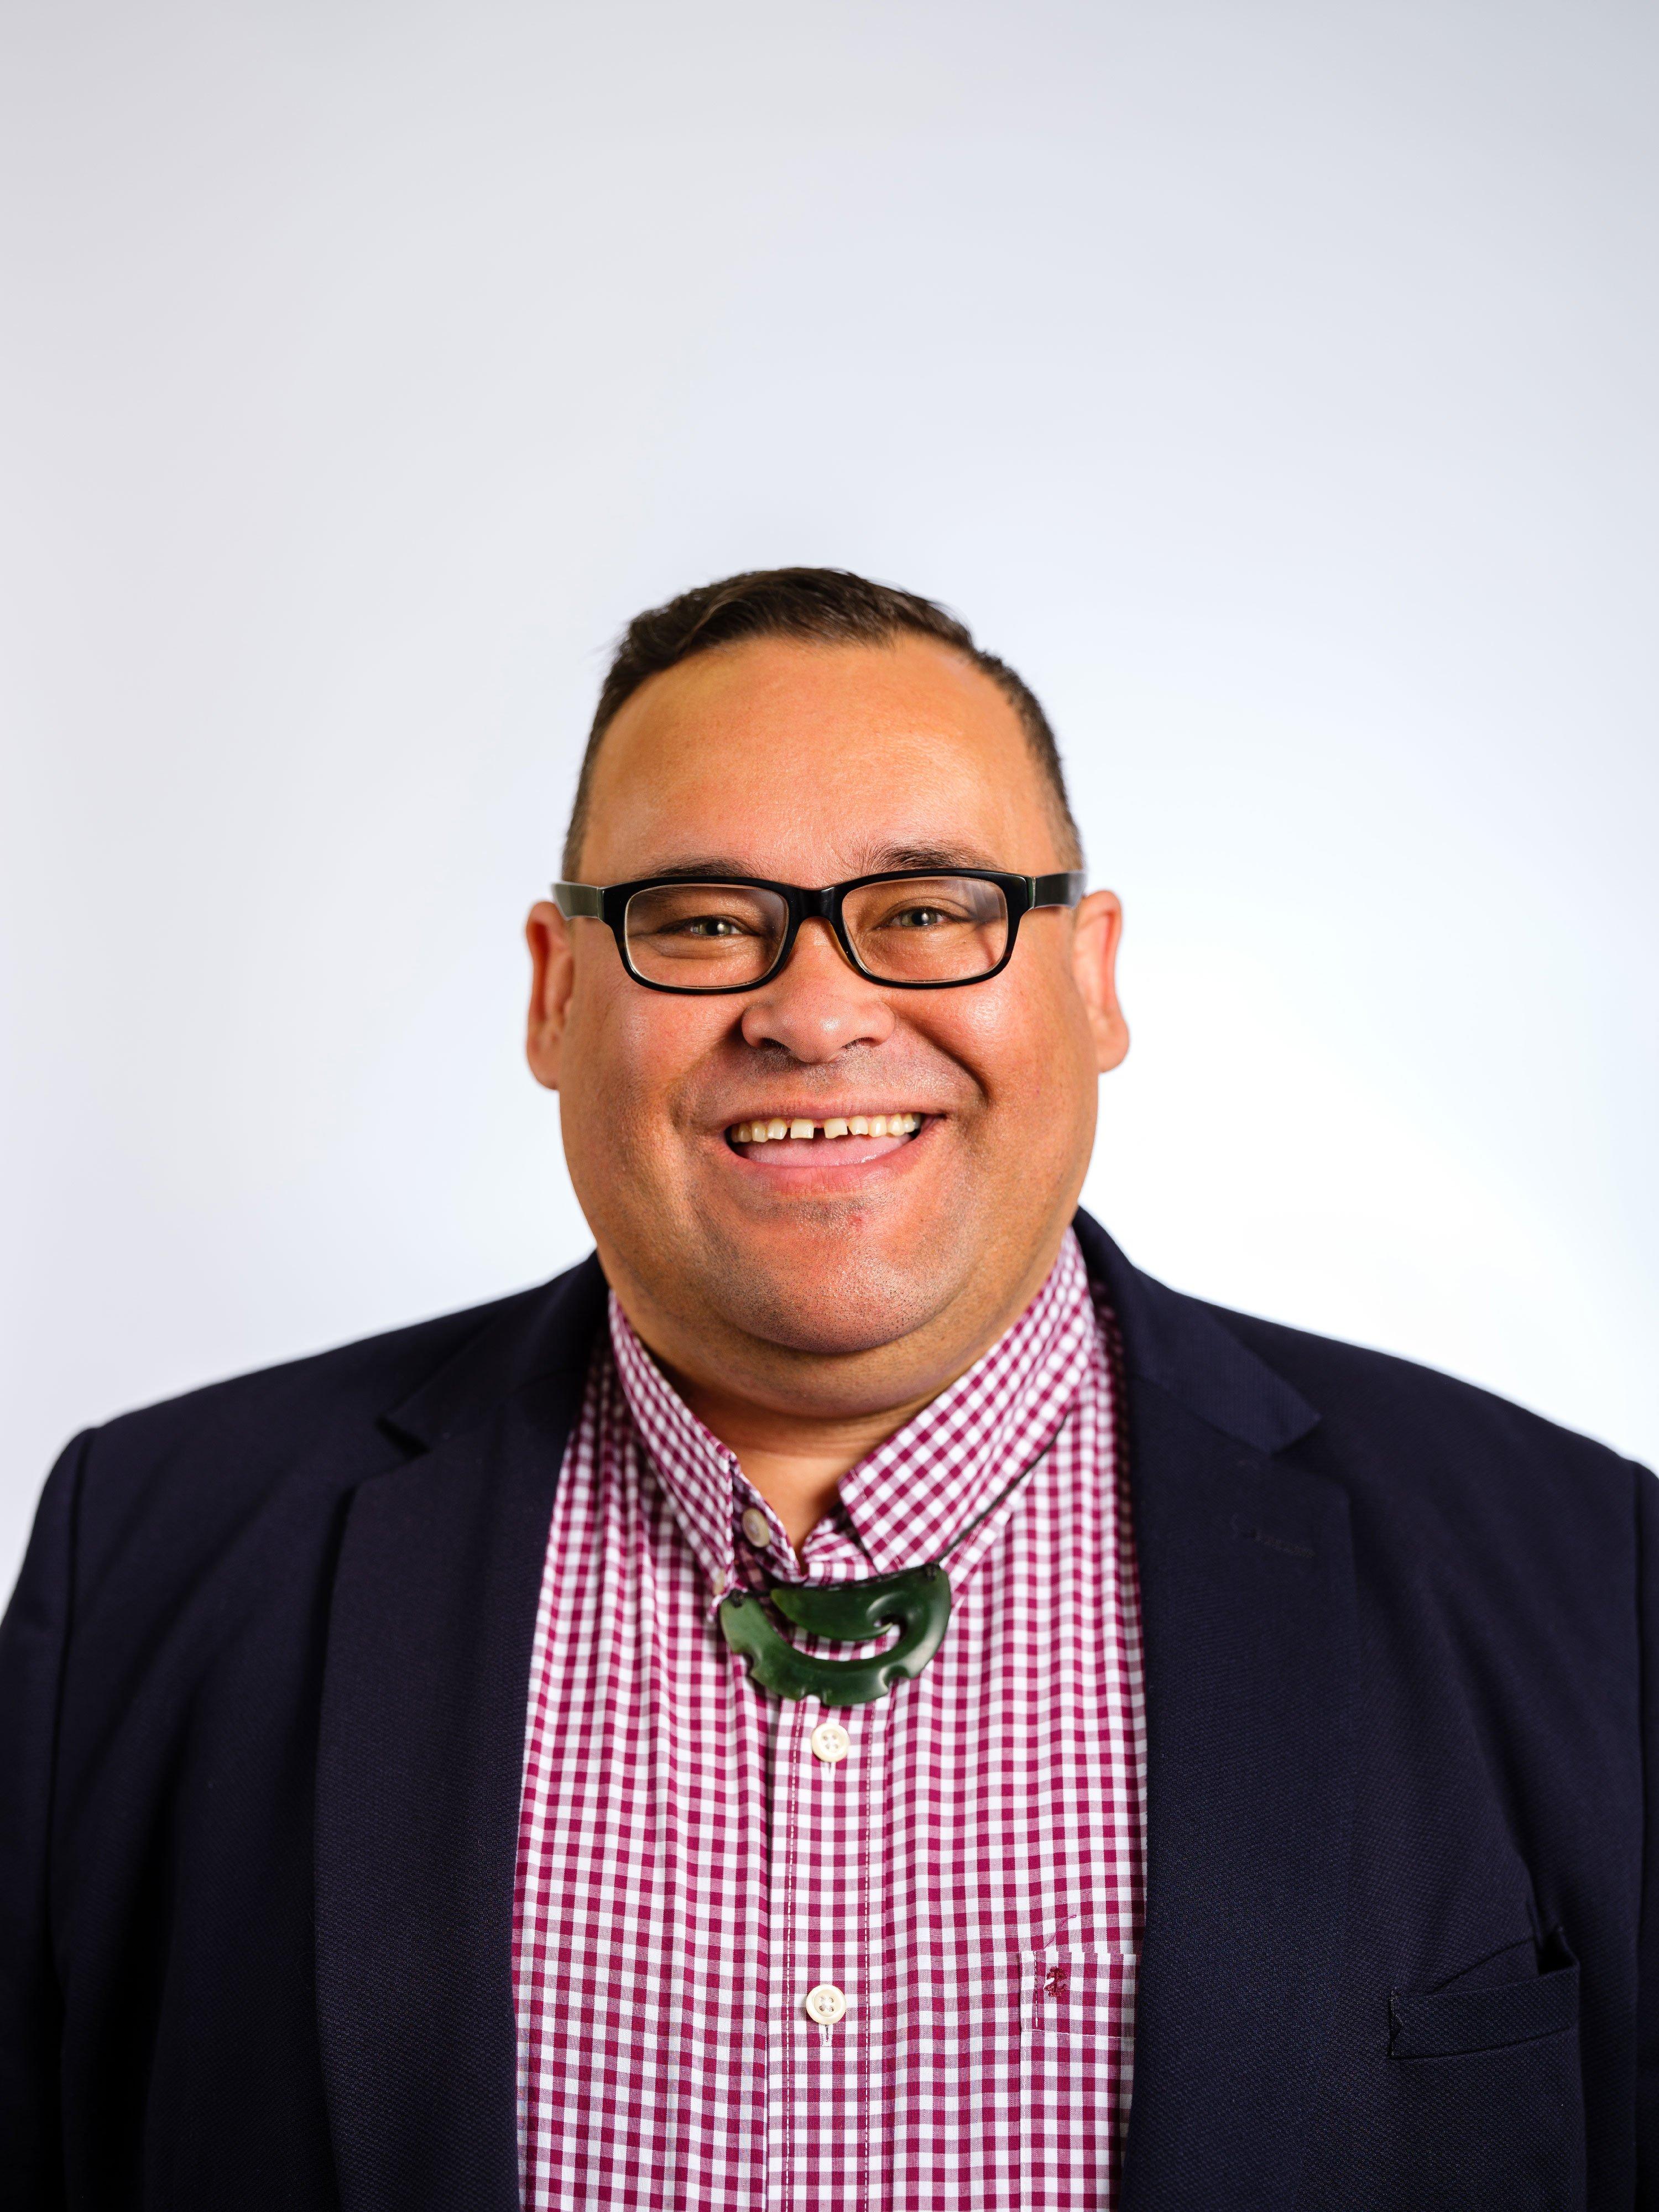 Geoff Hayward profile photo 2019